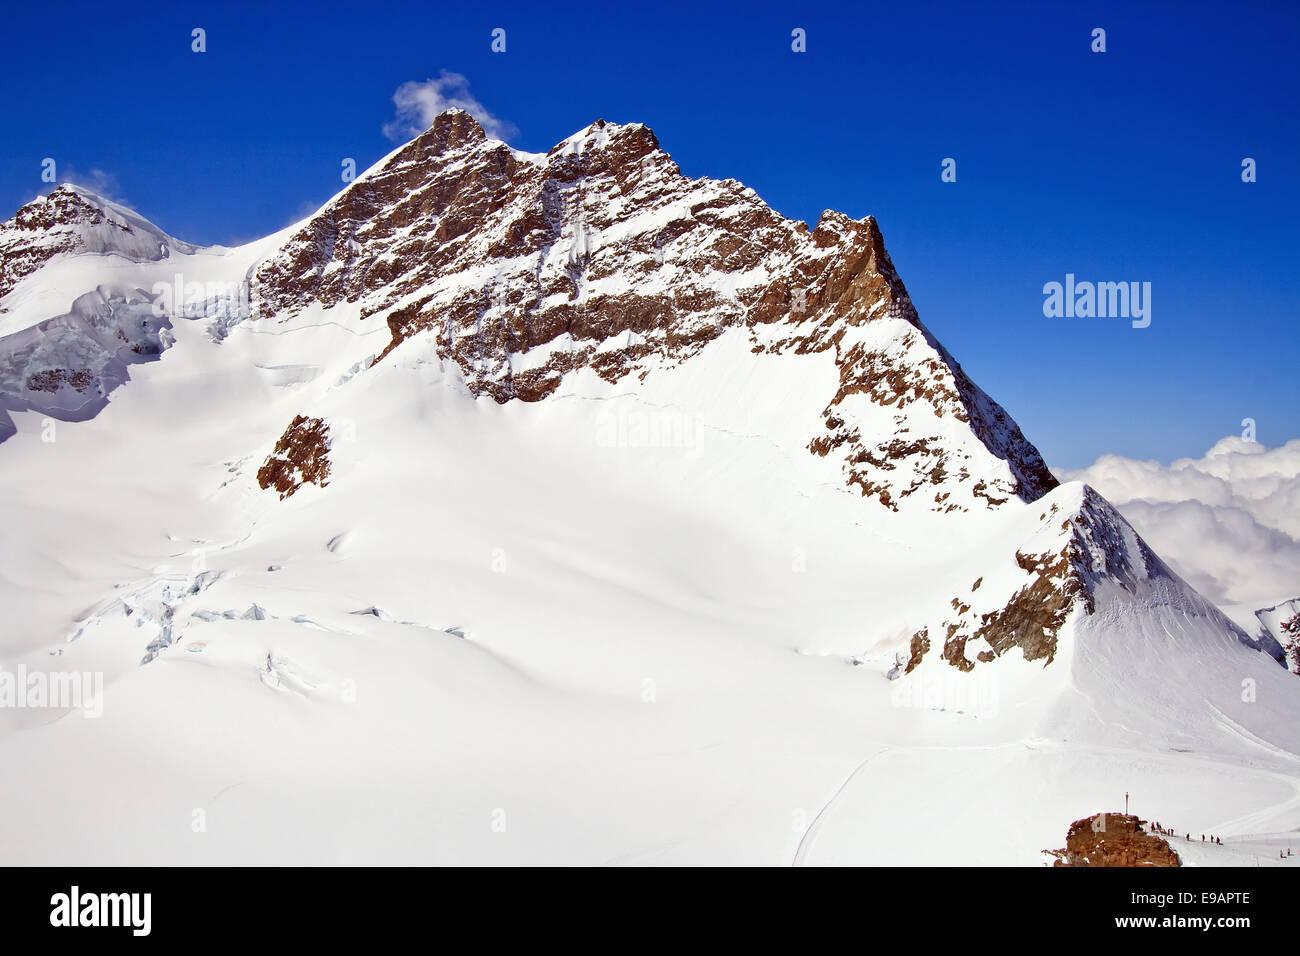 Die Schweizer Alpen Matterhorn Stockbild